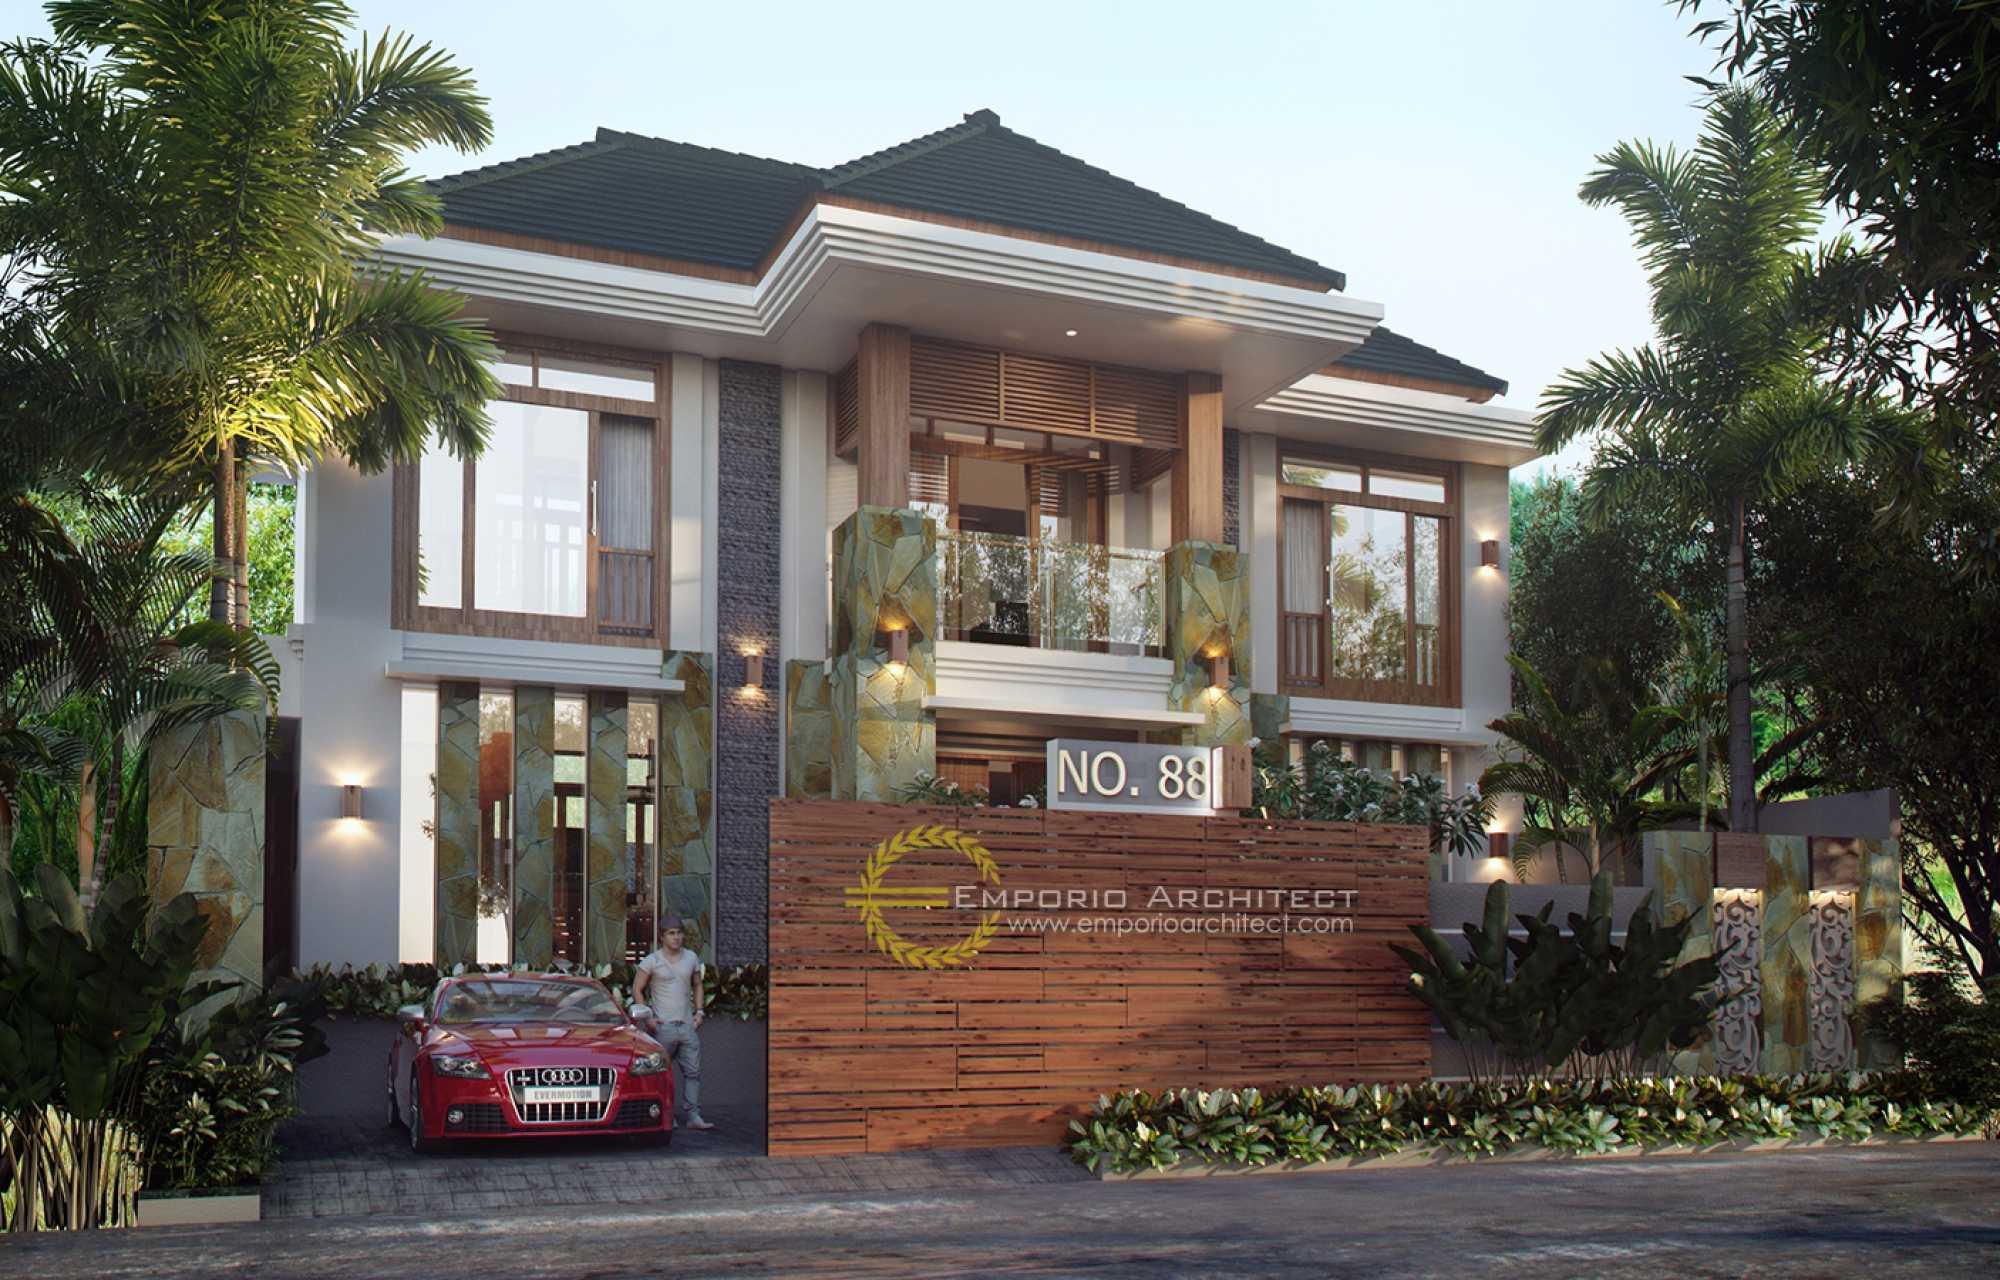 Emporio Architect Jasa Arsitek Kalimantan Desain Rumah Villa Bali Tropis 129 @ Kalimantan Kalimantan Timur, Indonesia Kalimantan Timur, Indonesia Emporio-Architect-Jasa-Arsitek-Kalimantan-Desain-Rumah-Villa-Bali-Tropis-129-Kalimantan Tropical  78722